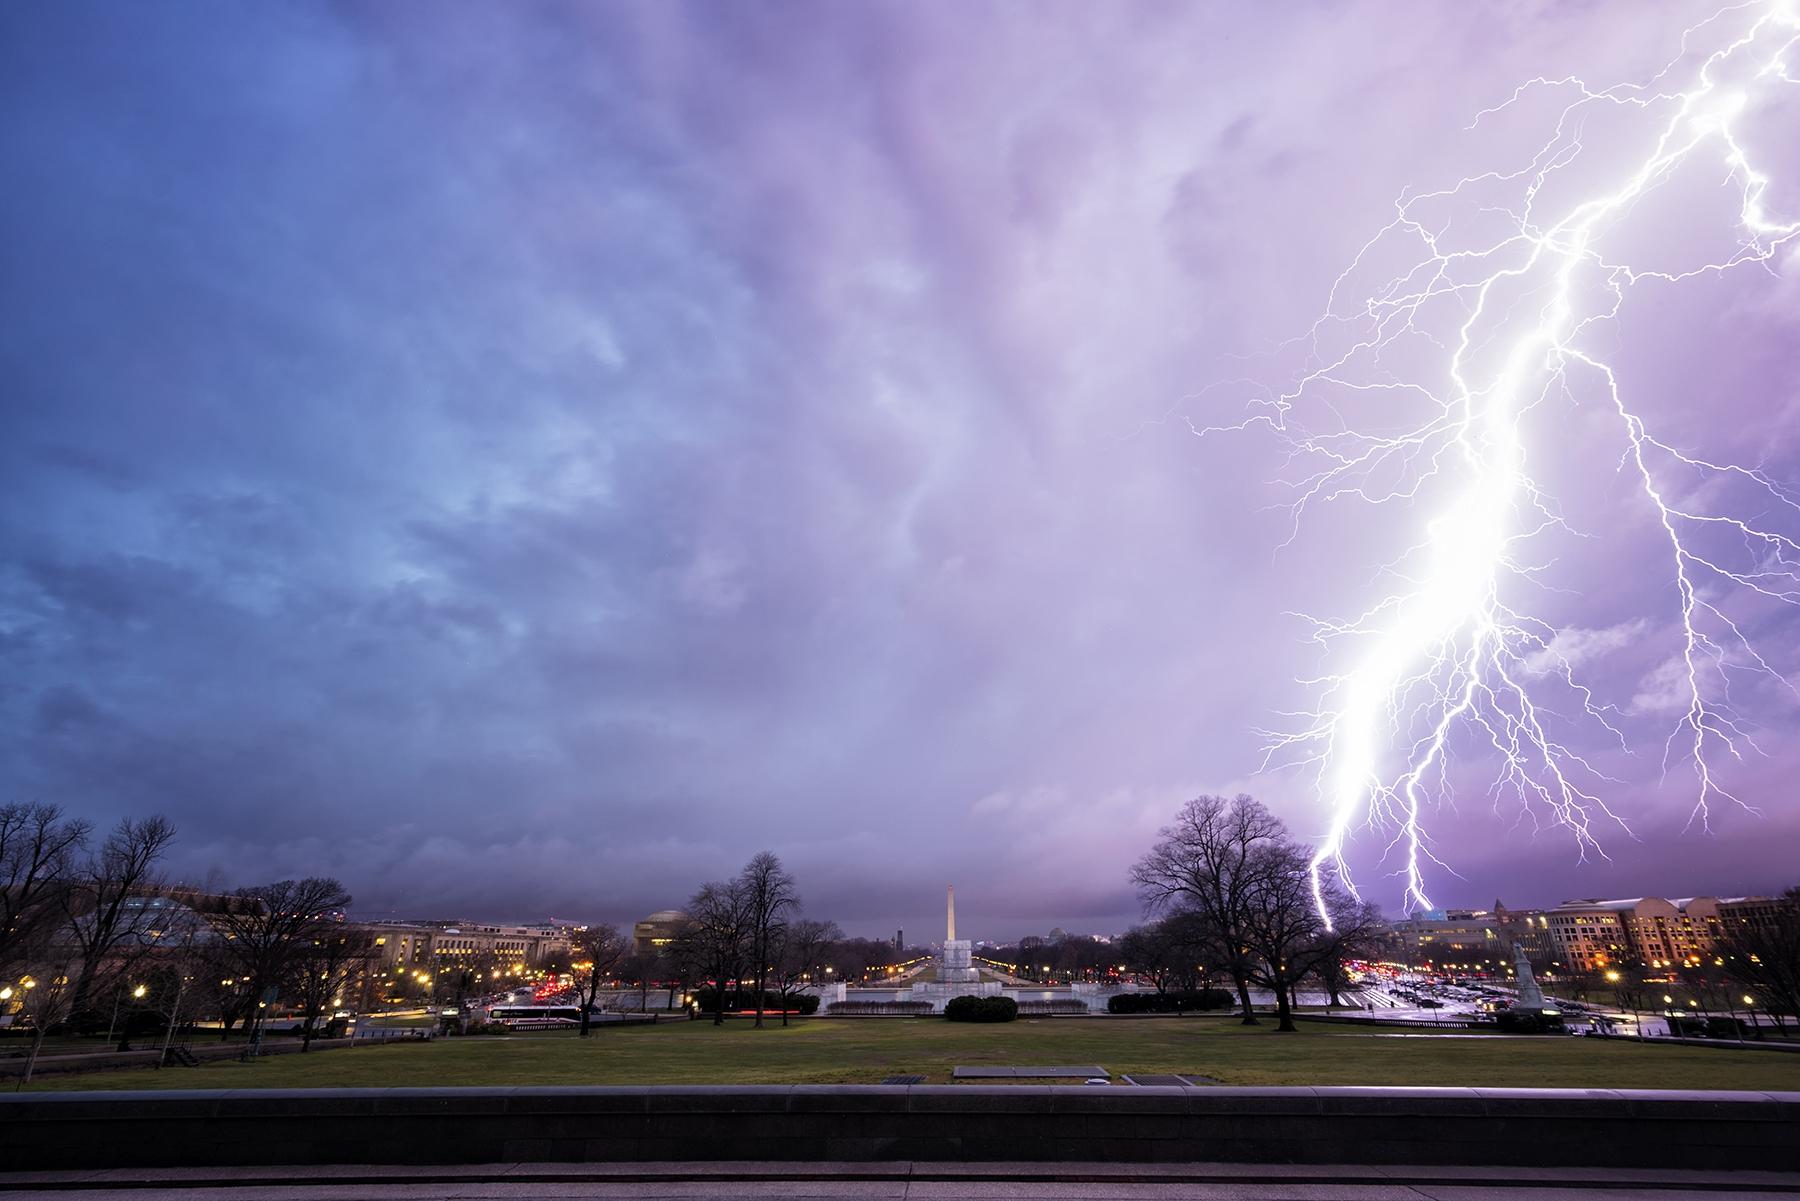 lightning, washington dc, tornado, washington monument, sunset, lightning, strike, electricity, severe, capitol, capital, storm, rain, clouds, weather, awesome